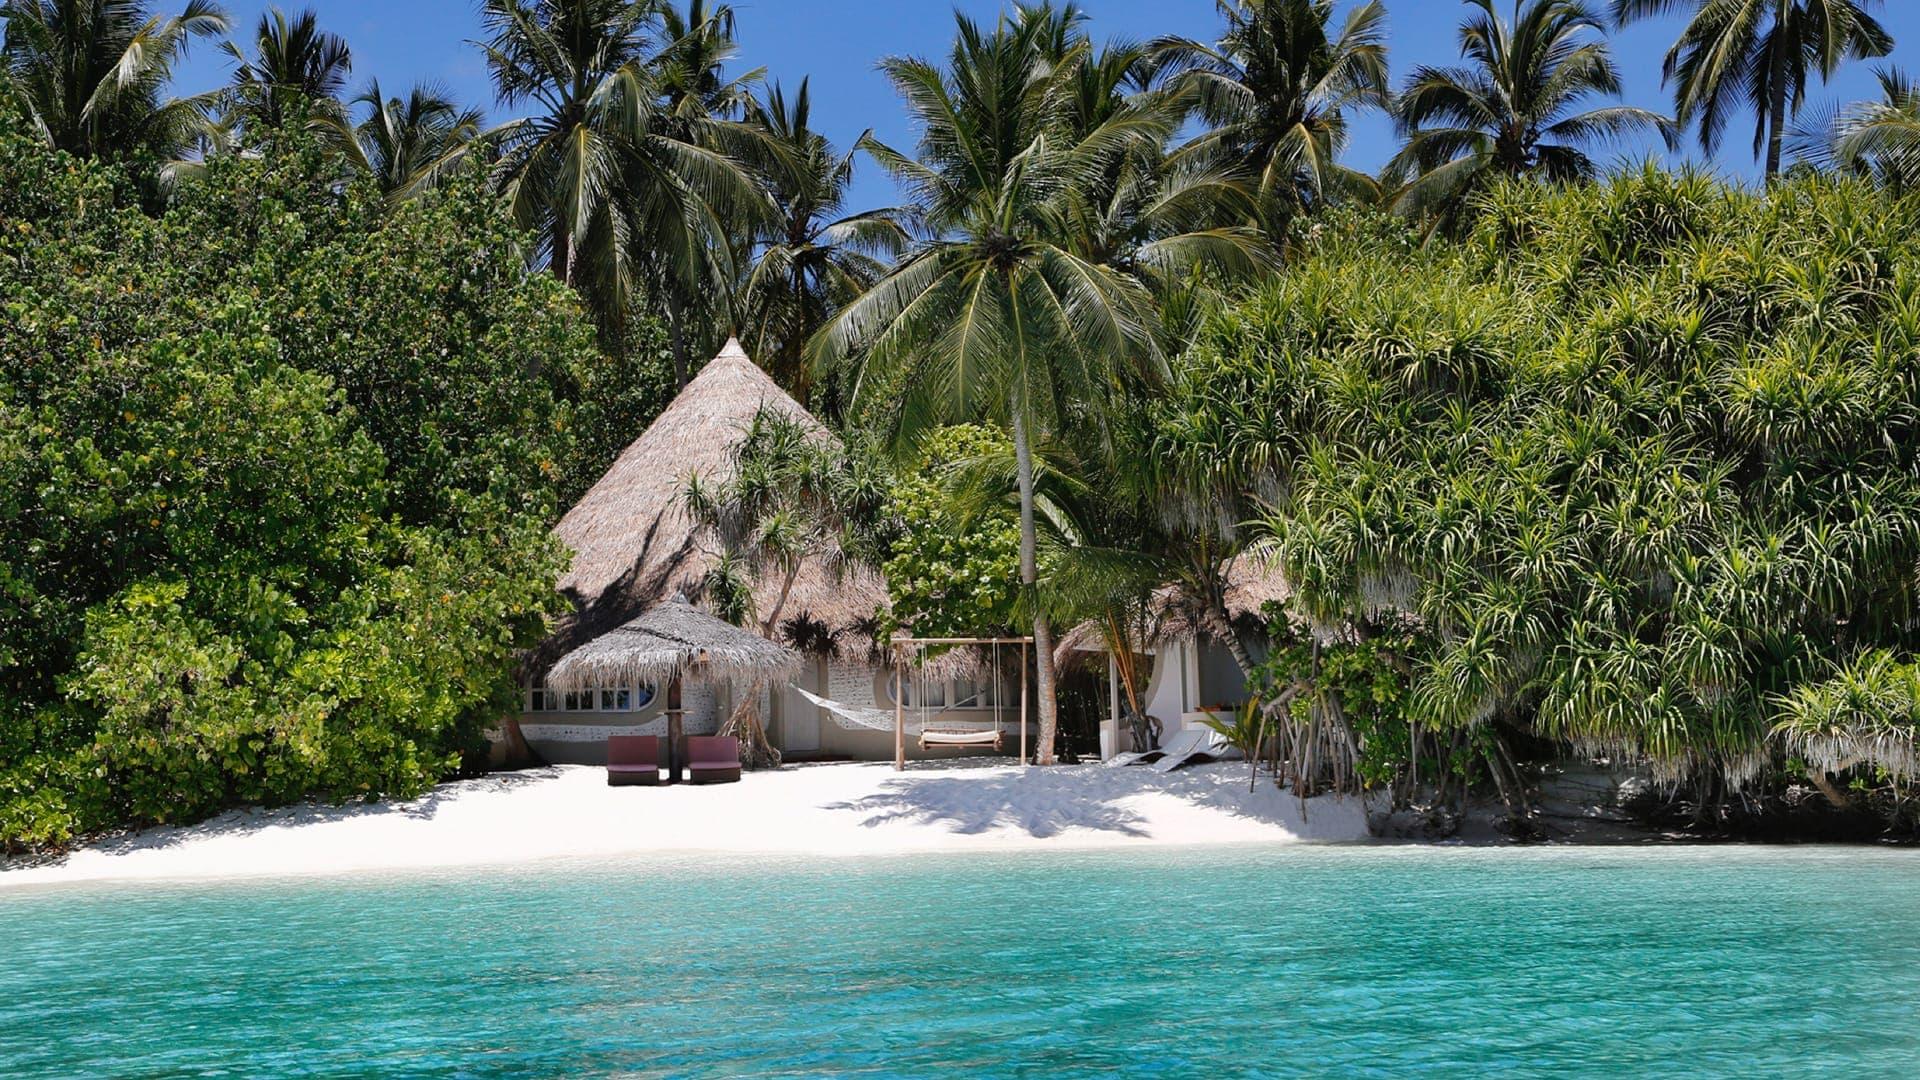 Nika Island Resort 4* Maldive